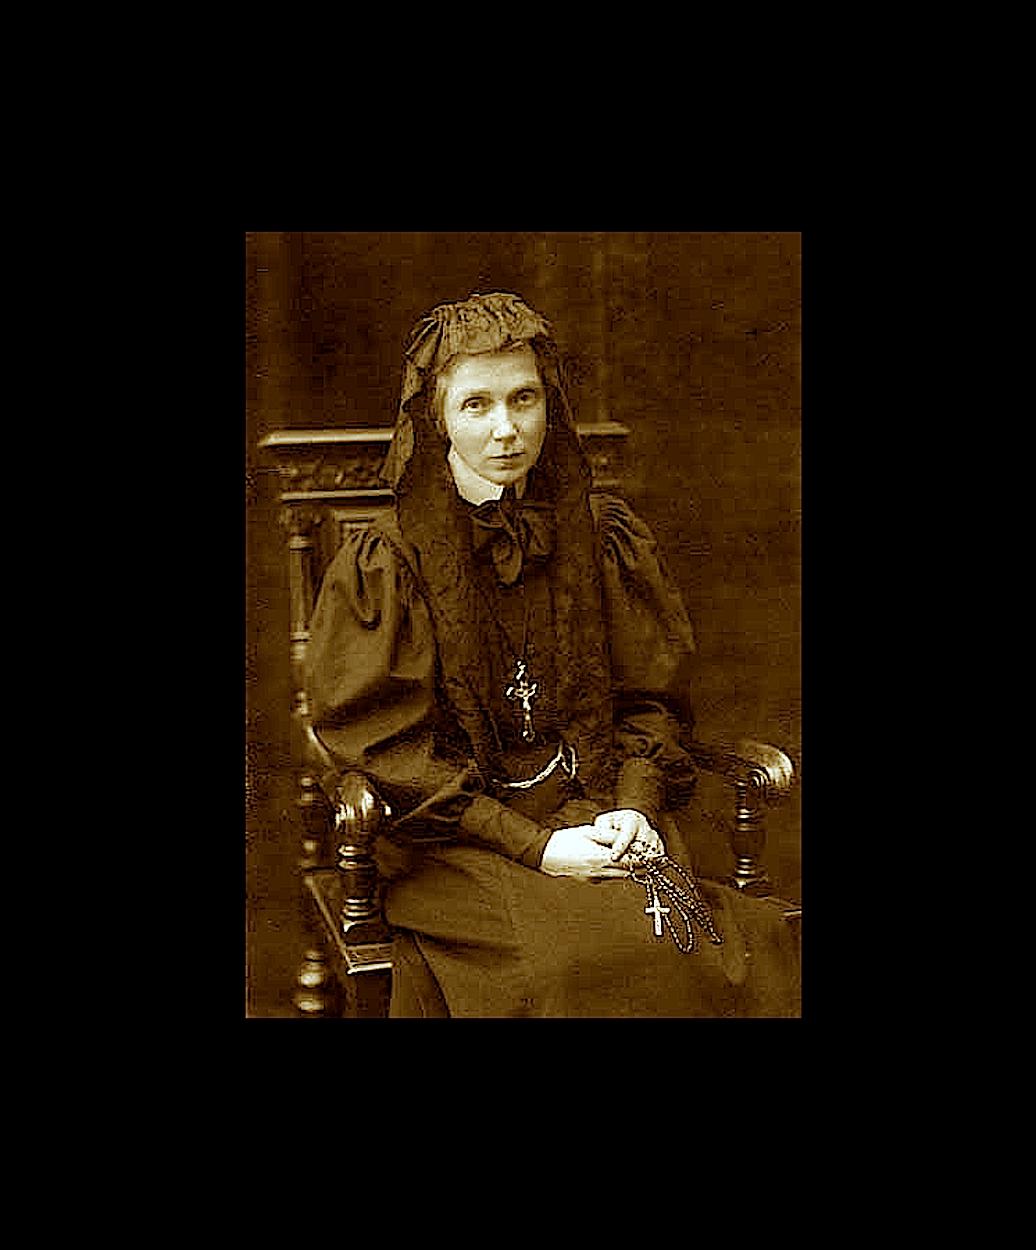 Ursula Leduhovskaya in St. Petersburg